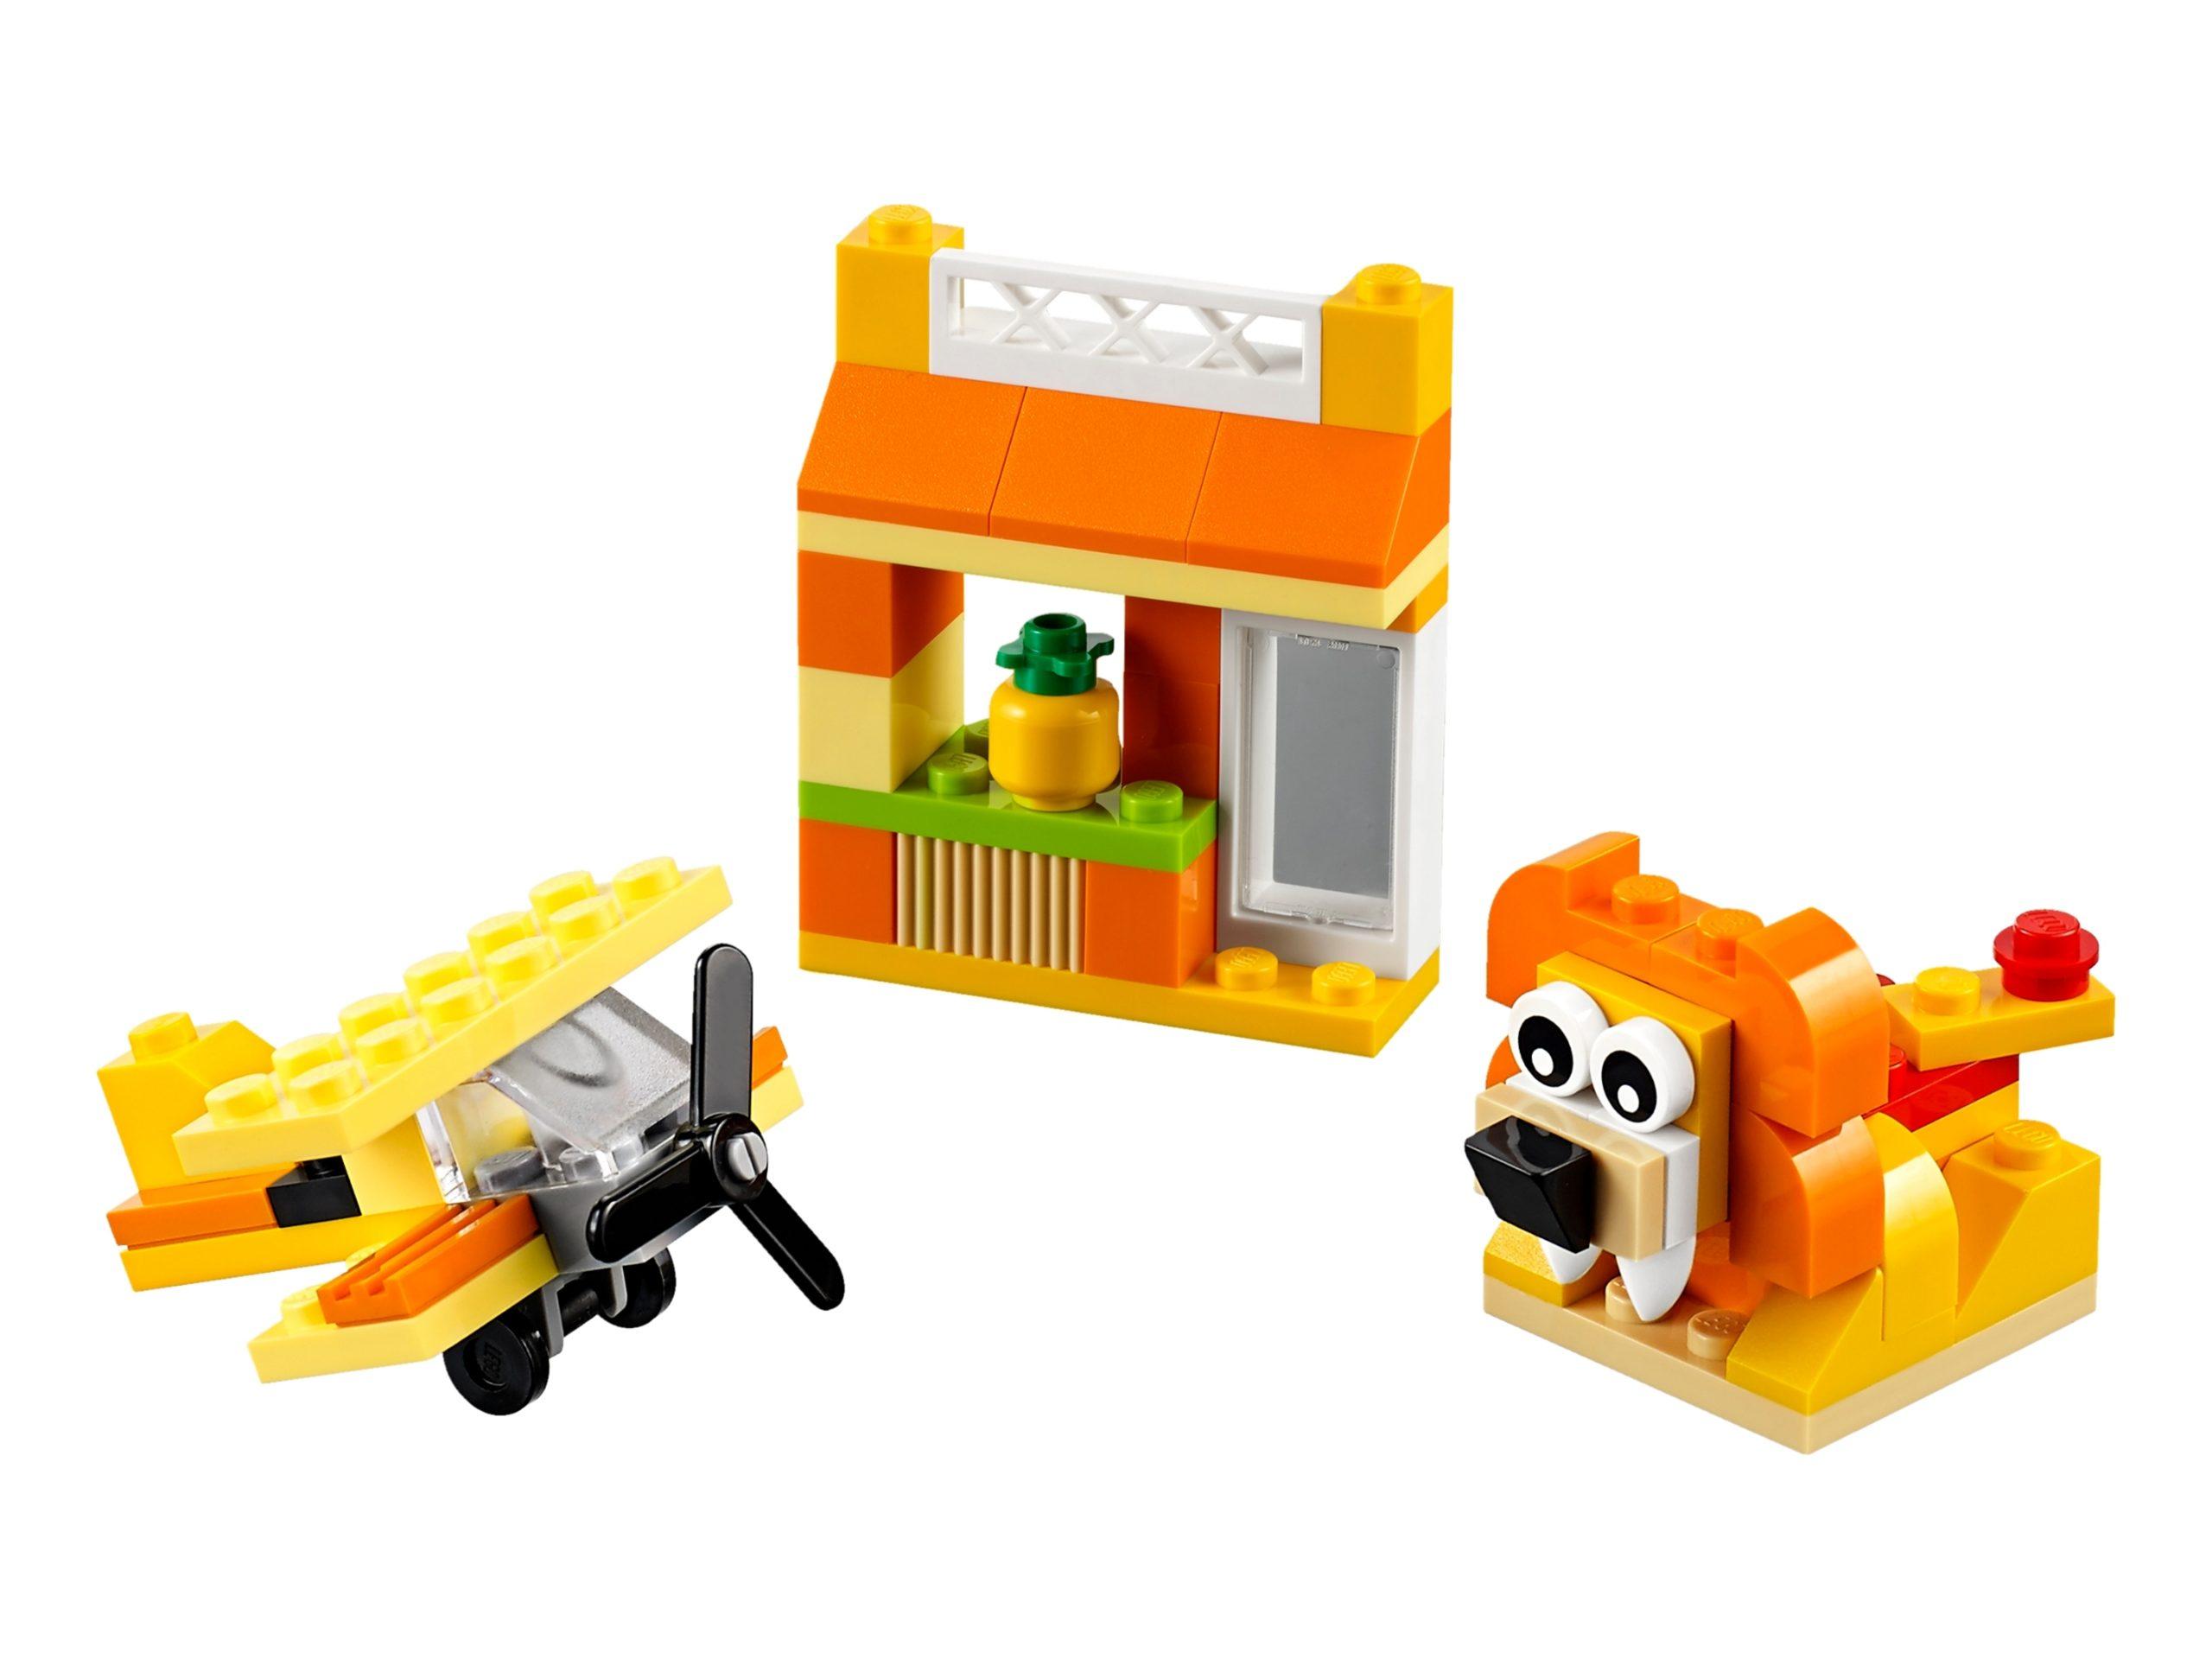 lego 10709 boite de construction orange scaled